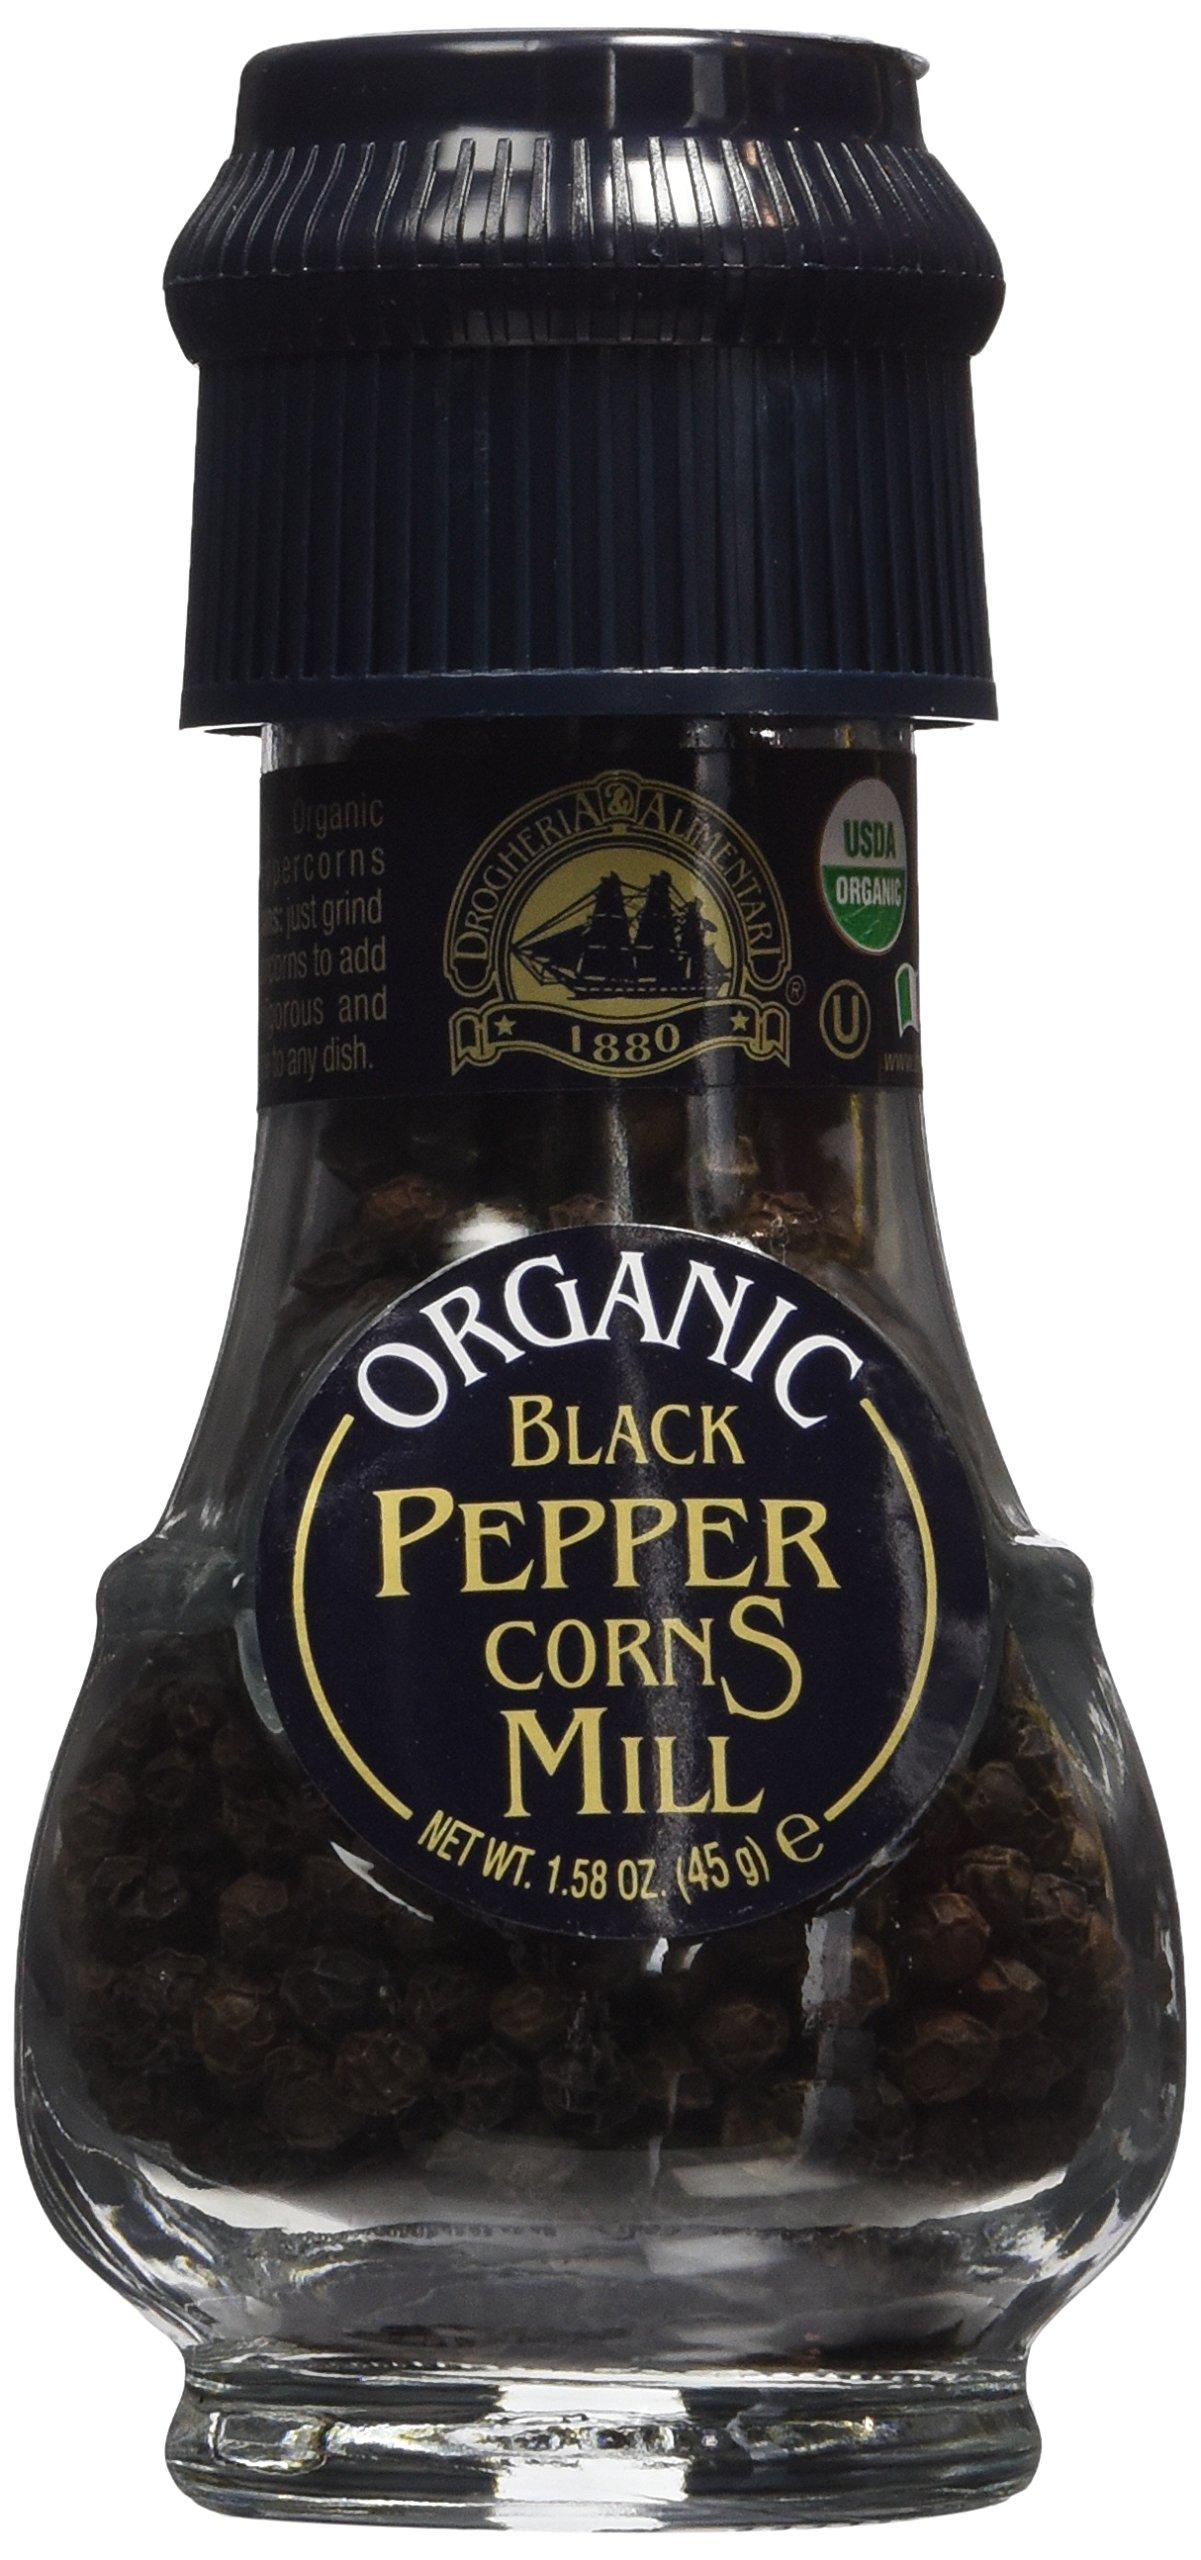 Drogheria & Alimentari All Natural Spice Grinder Black Peppercorns, 1.58 Ounce Jars (Pack of 3)